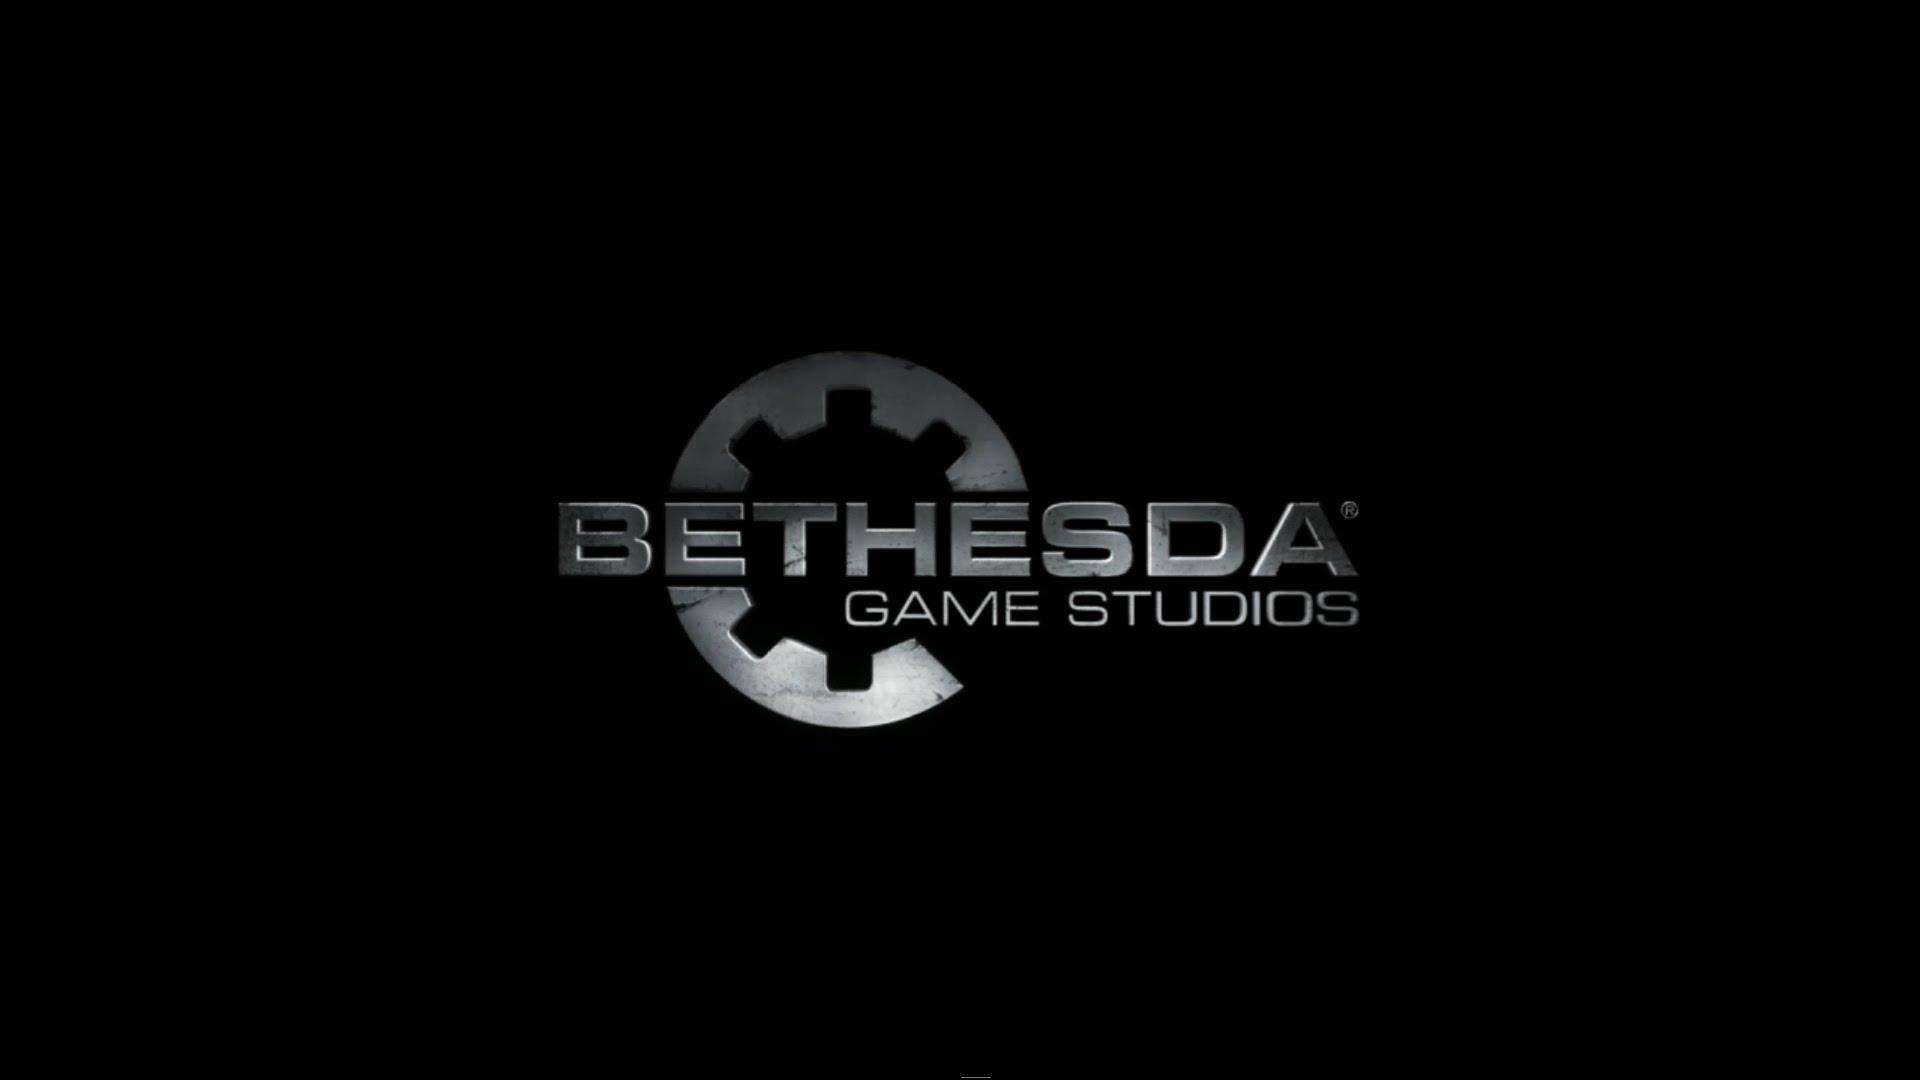 DOOM VFR Demonstrated at the Bethesda E3 2017 Showcase